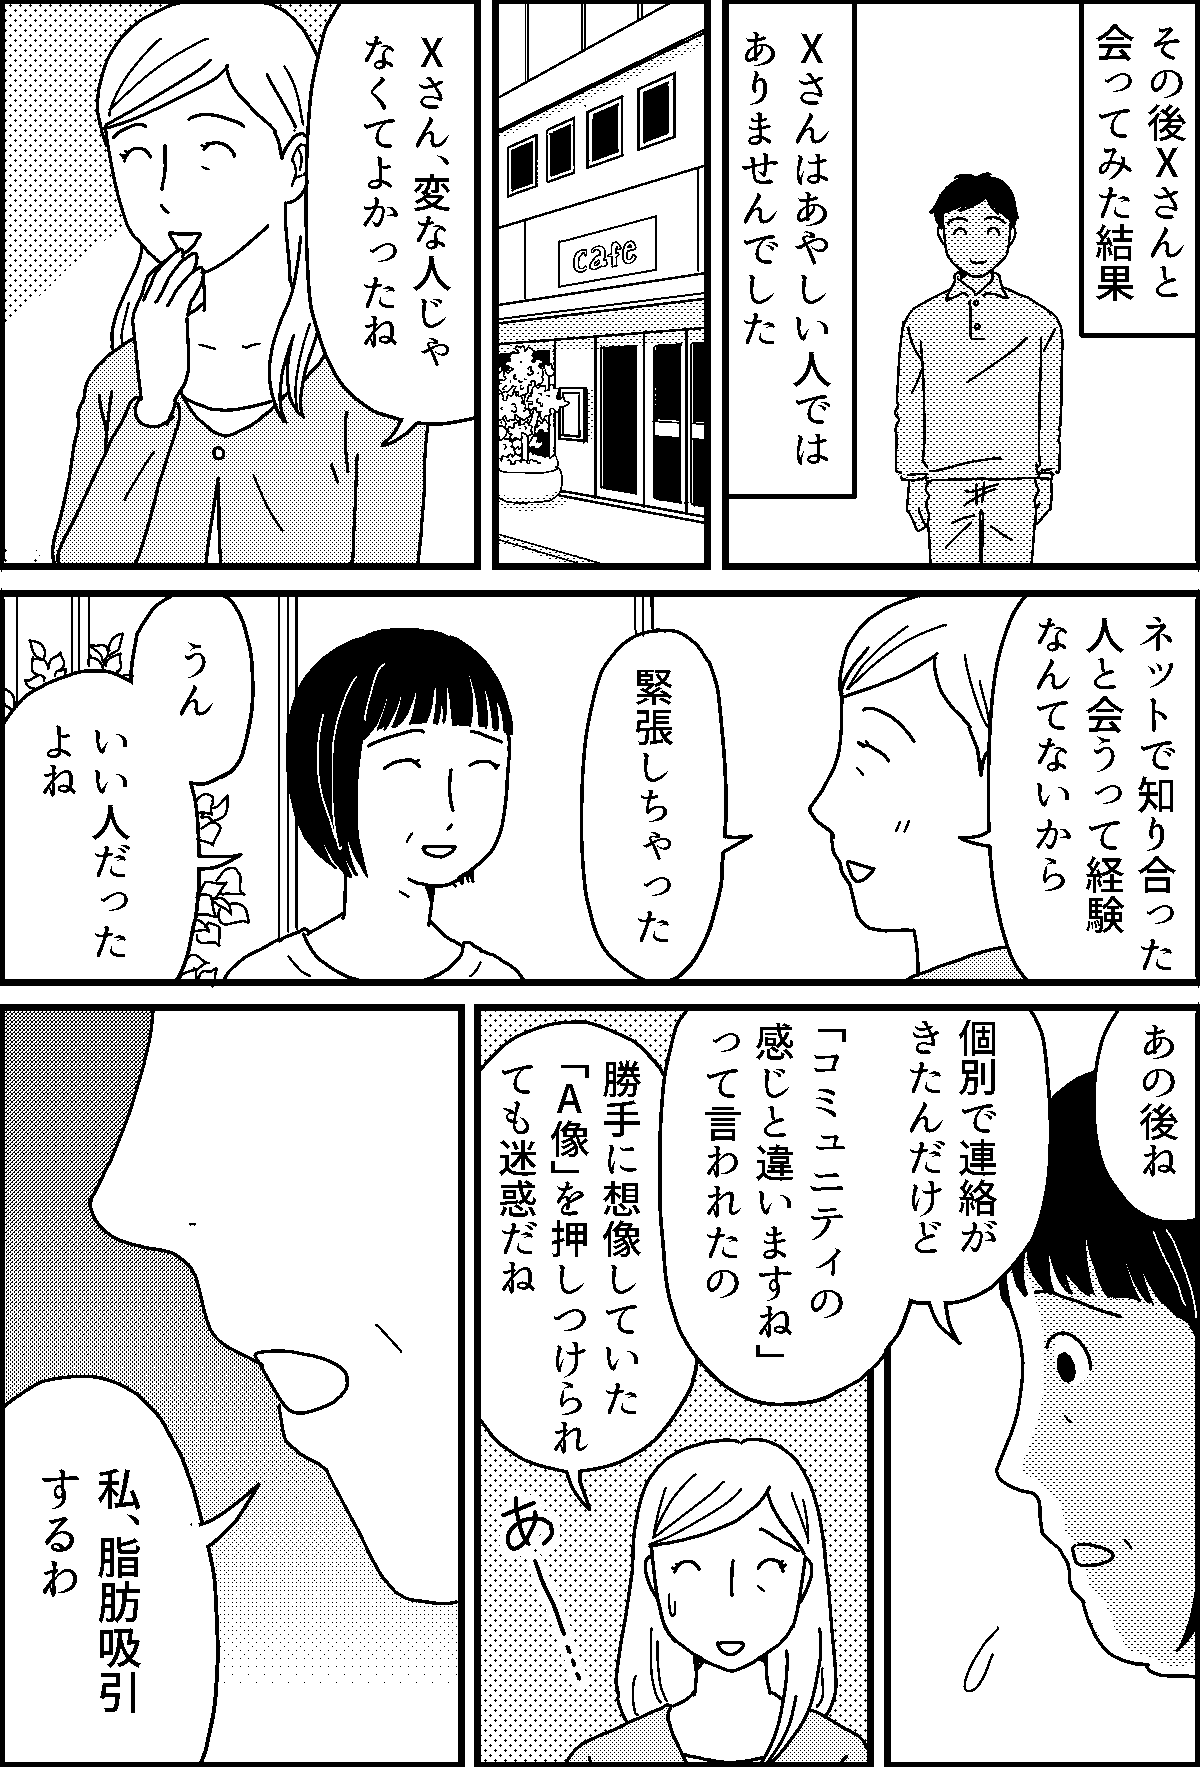 2-3 (1)